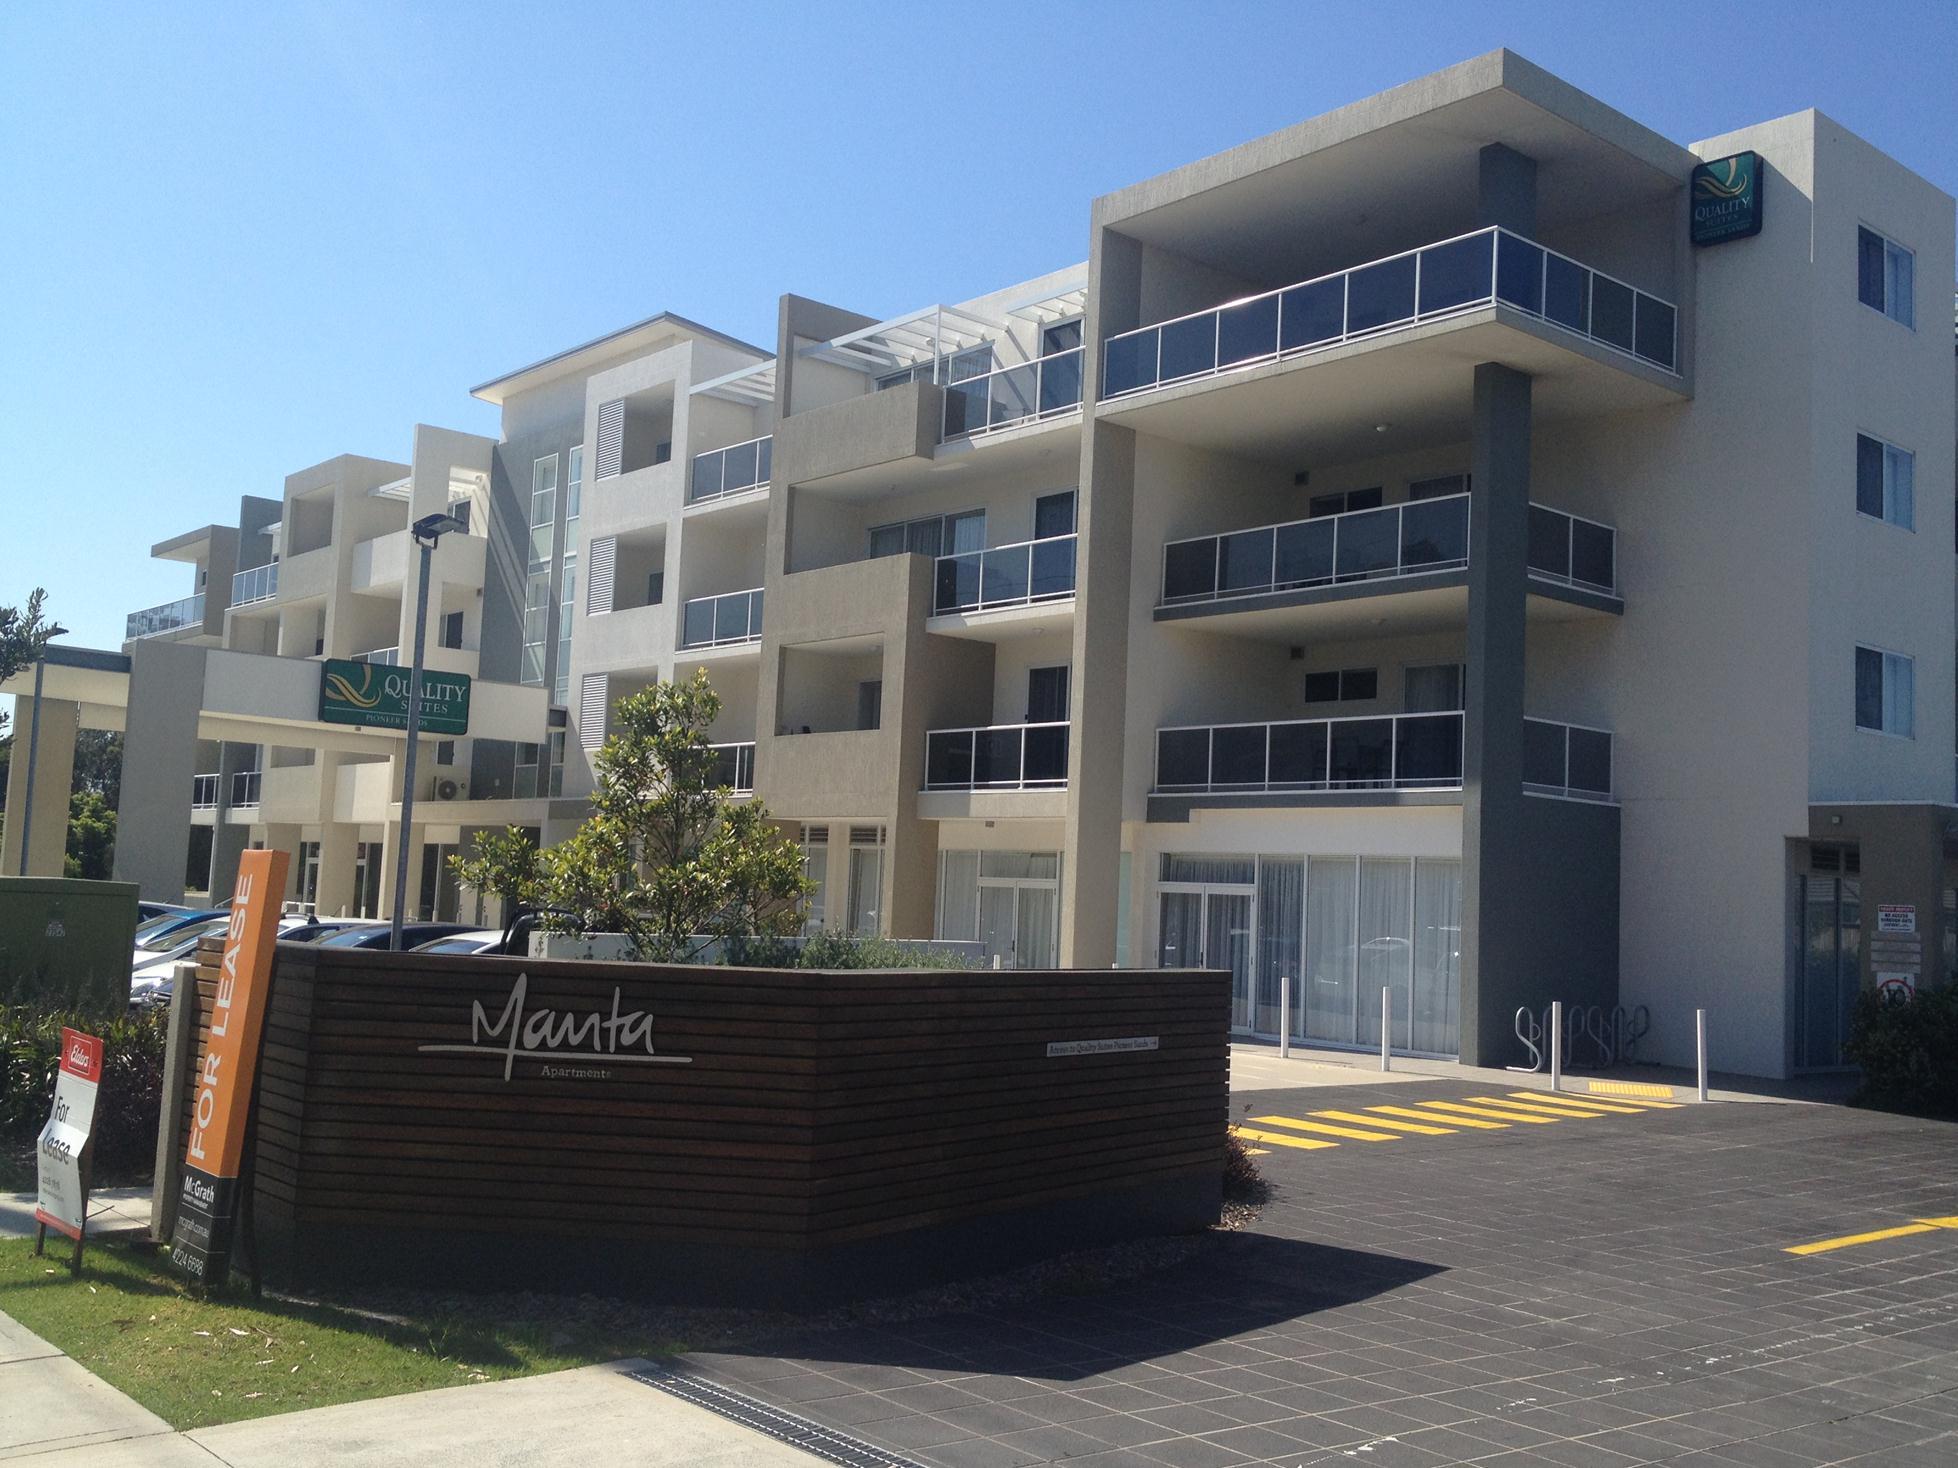 Mantra Appartments Trio Plumbing Mantra Apartments